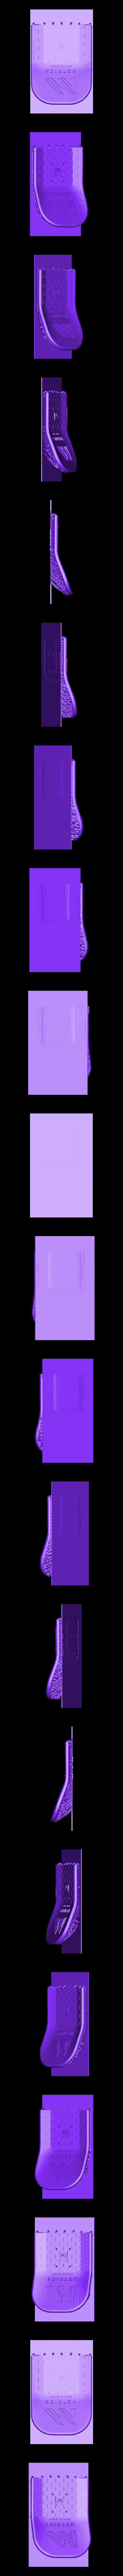 izquierda skate final.stl Download free STL file SKATE METRICS • 3D printable model, cloko